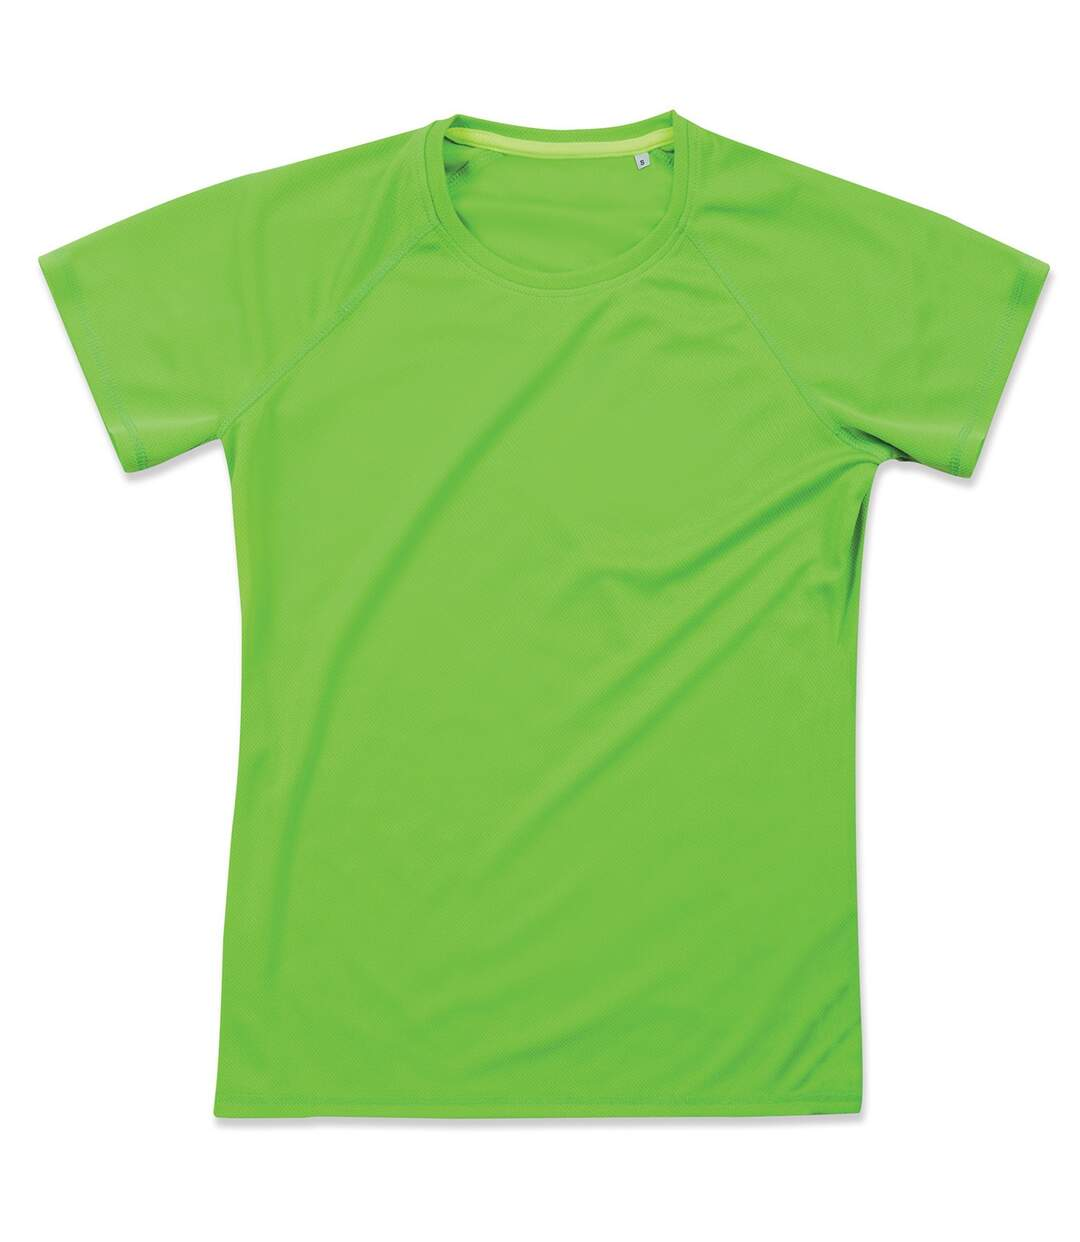 Stedman Womens/Ladies Raglan Mesh T-Shirt (Kiwi Green) - UTAB347